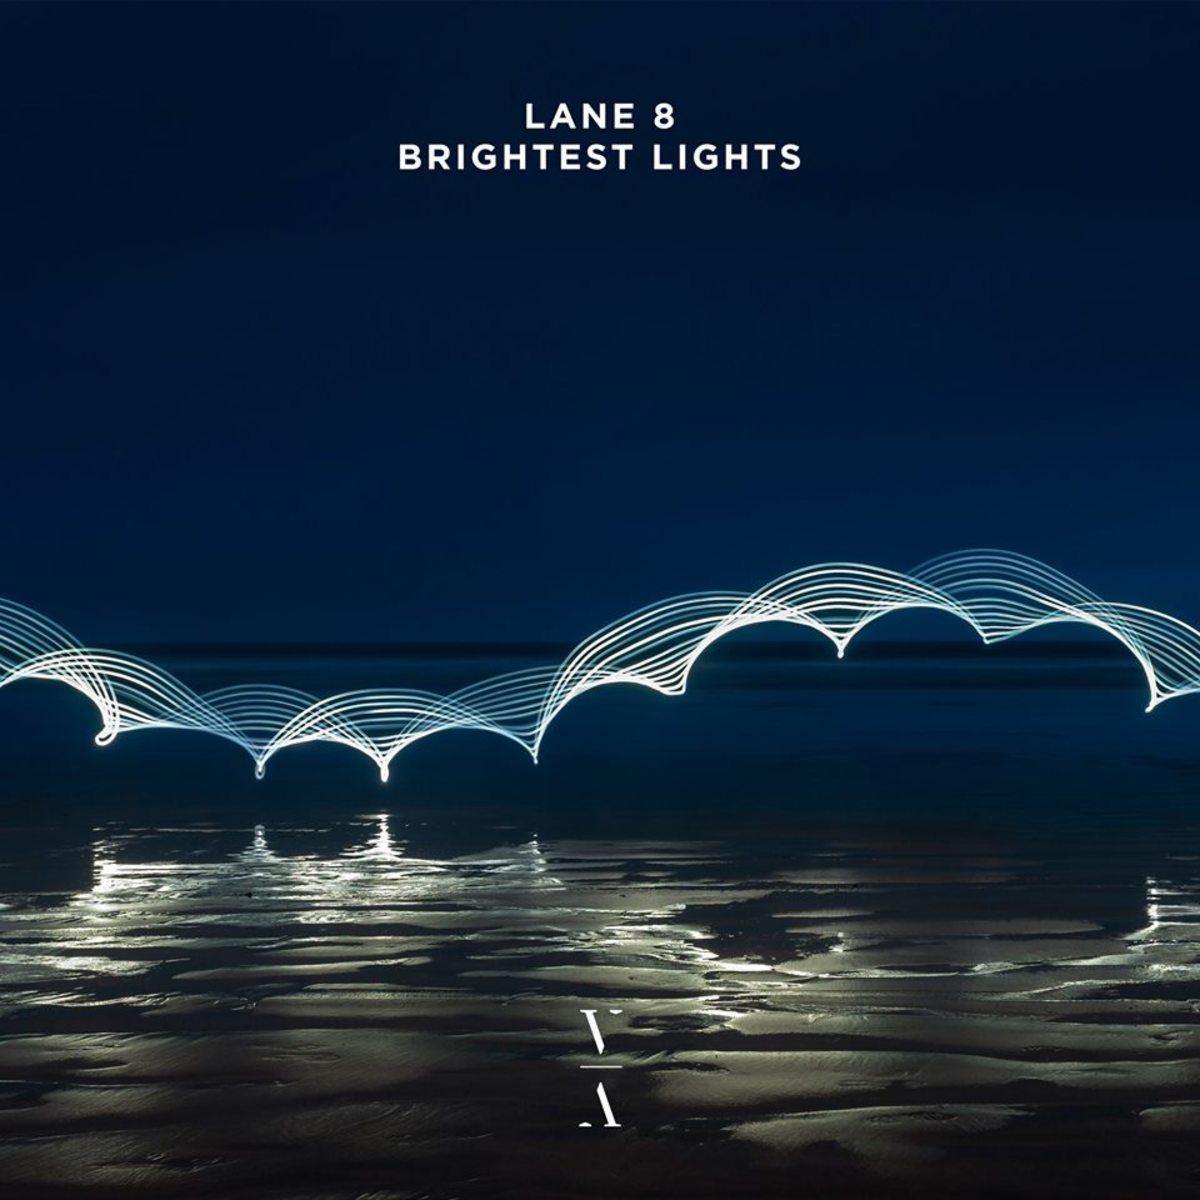 Lane 8 Brightest Lights